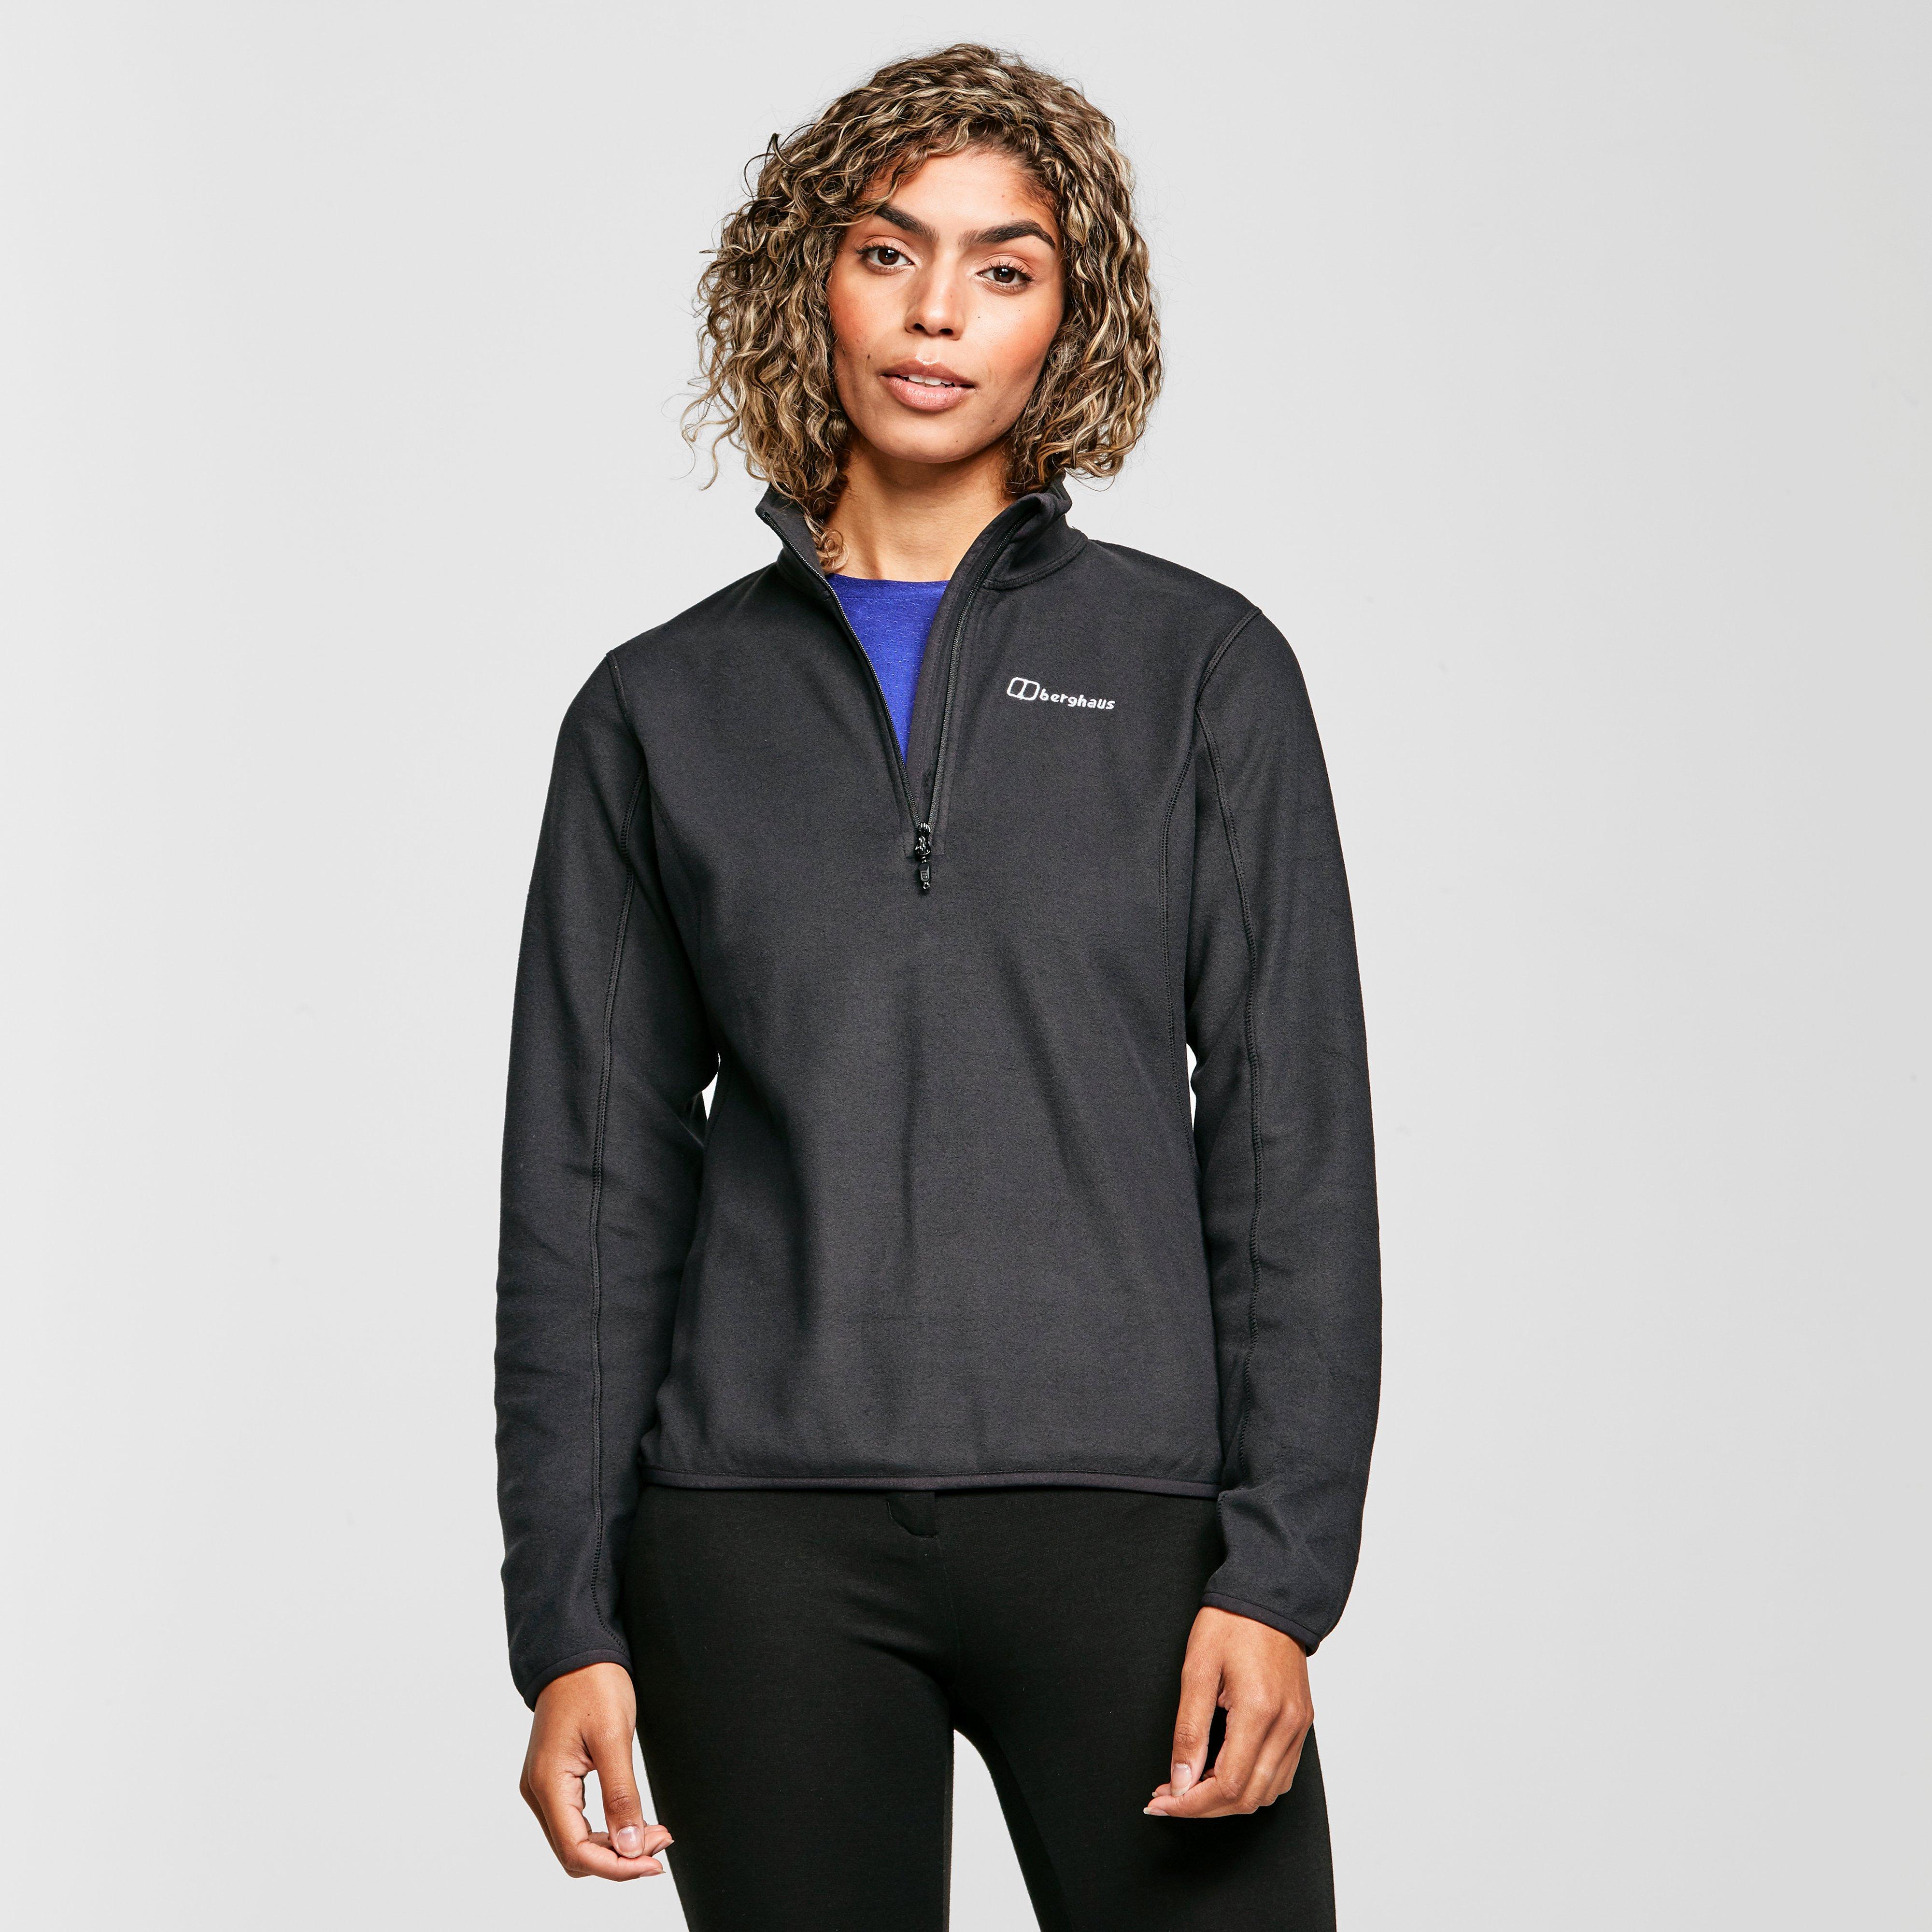 Berghaus Womens Hendra Half-zip Fleece - Black/blk$  Black/blk$